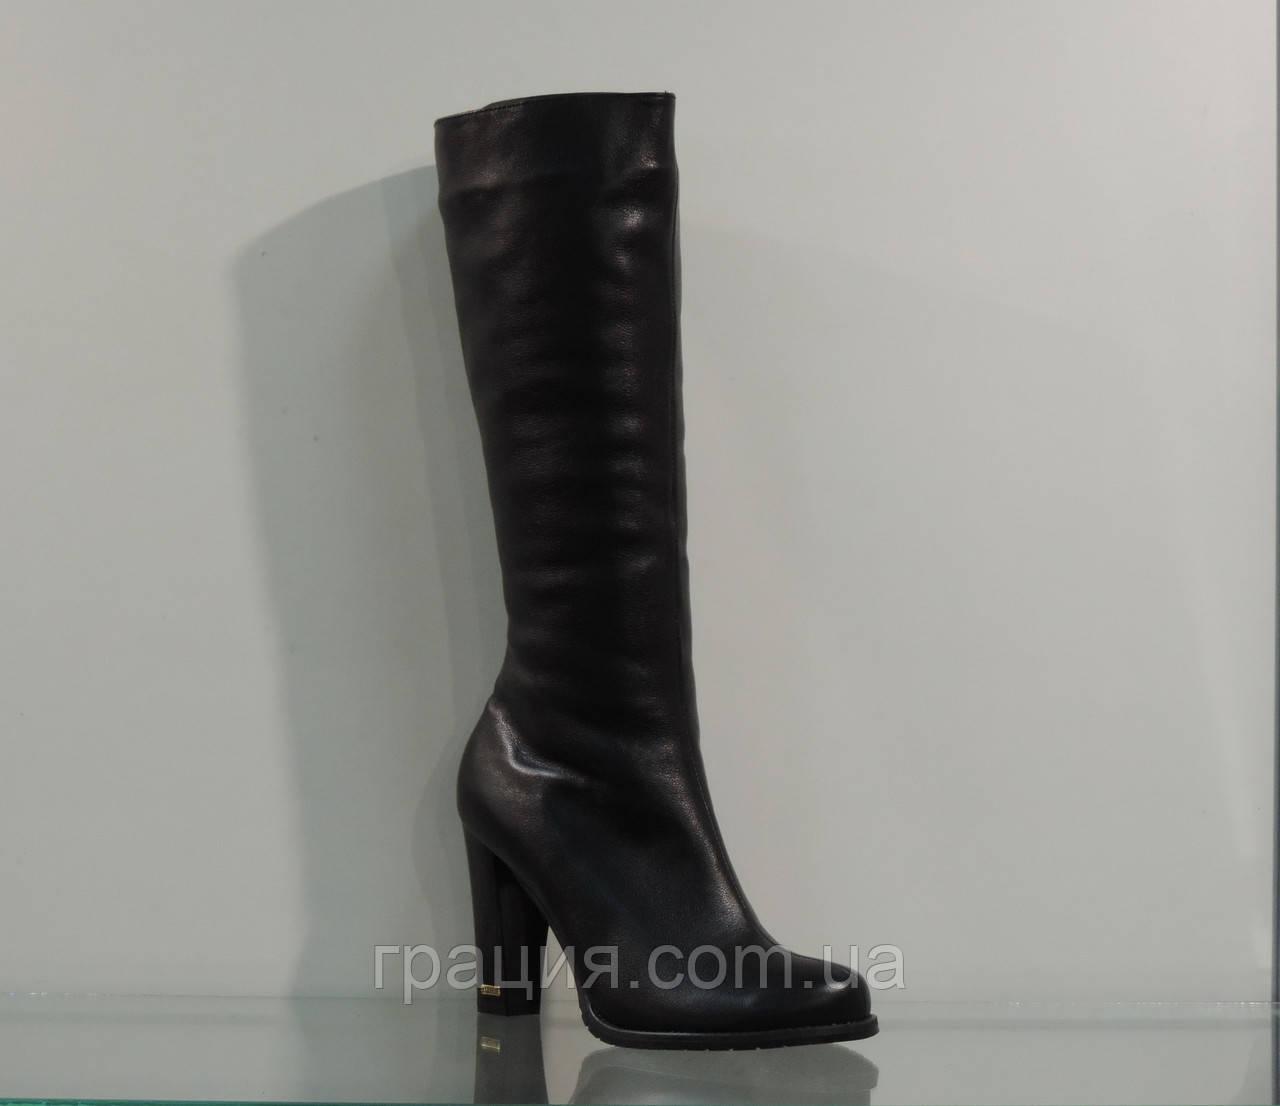 Зимние кожаные сапожки на каблуке на узкую ногу